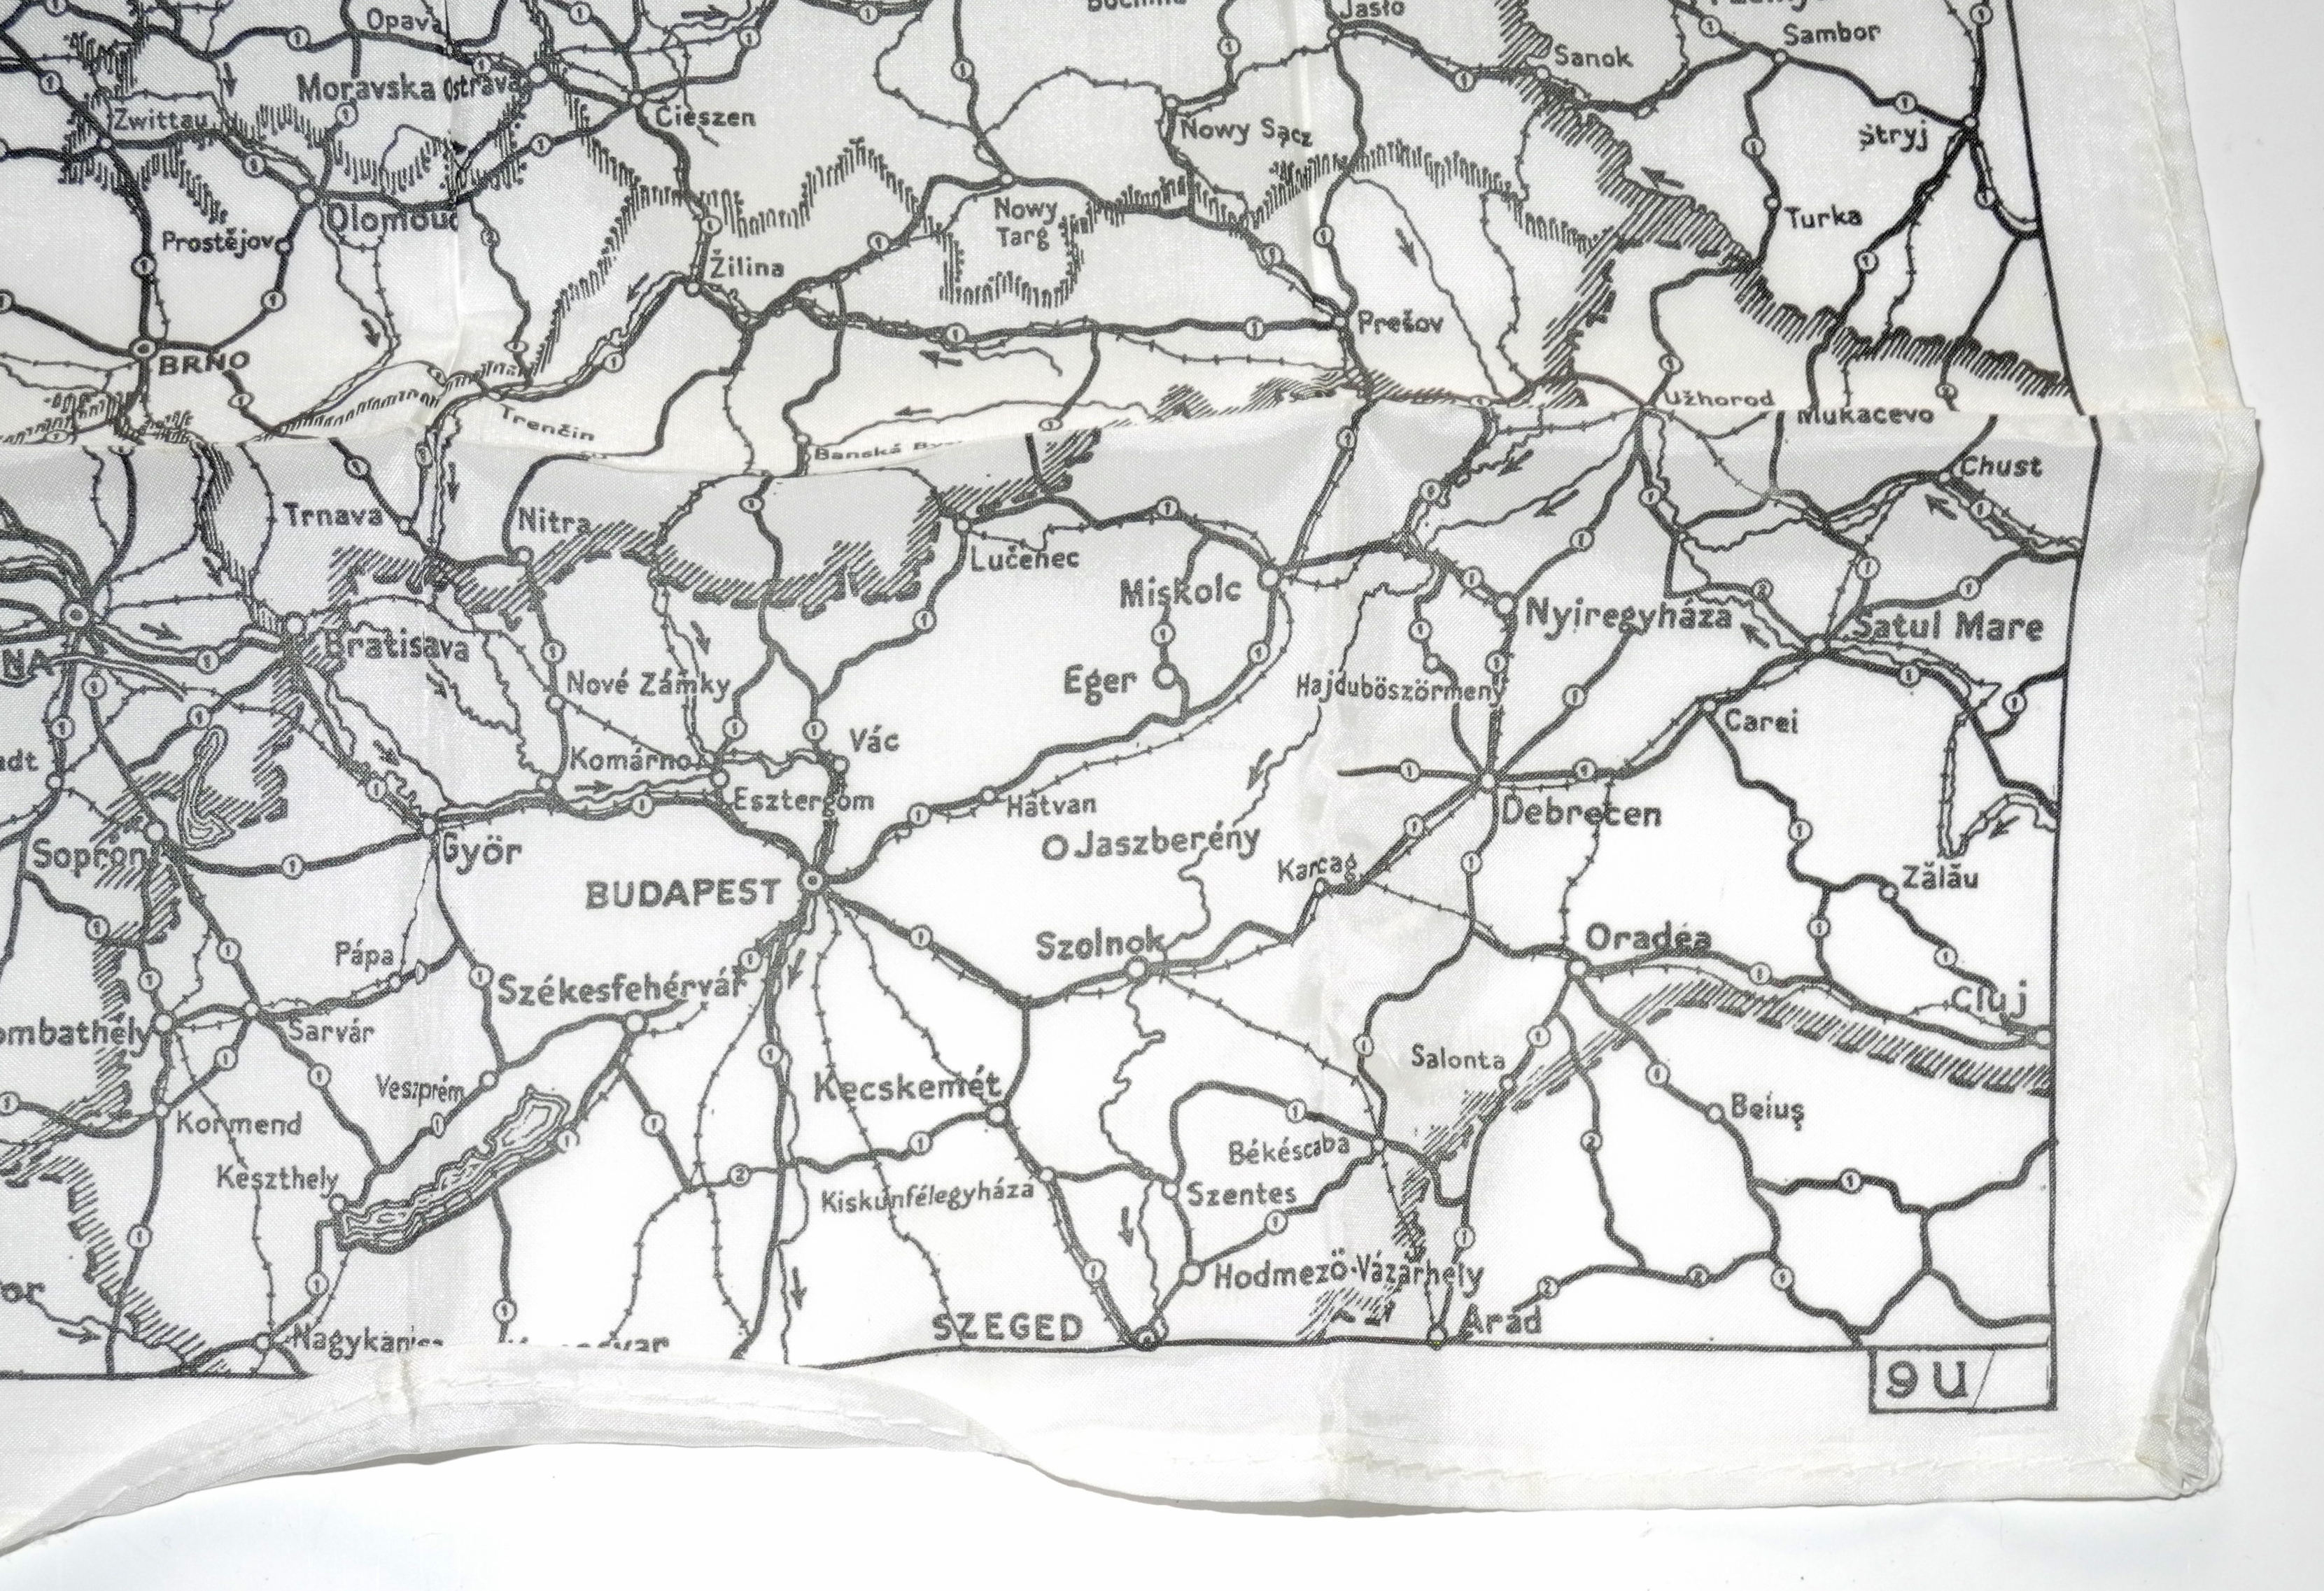 RAF Escape Map - Batholomew Series 9U - Germany